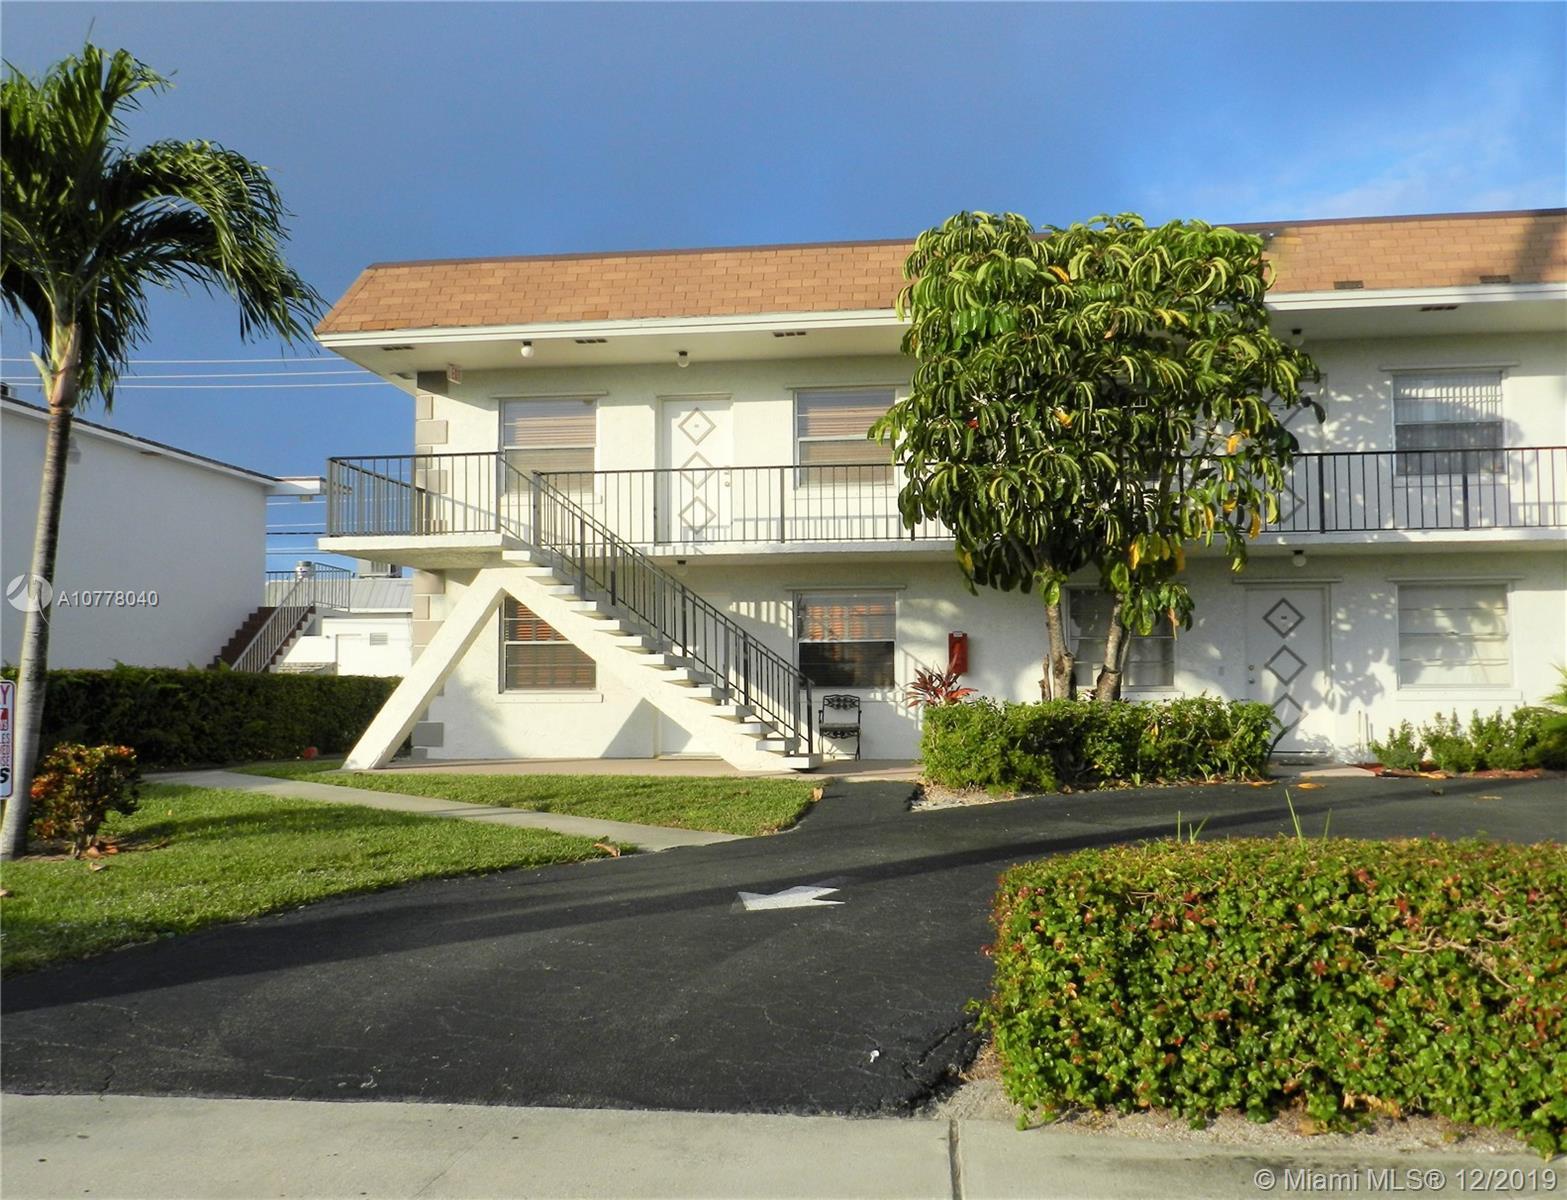 227 Castlewood Dr 101, North Palm Beach, FL 33408